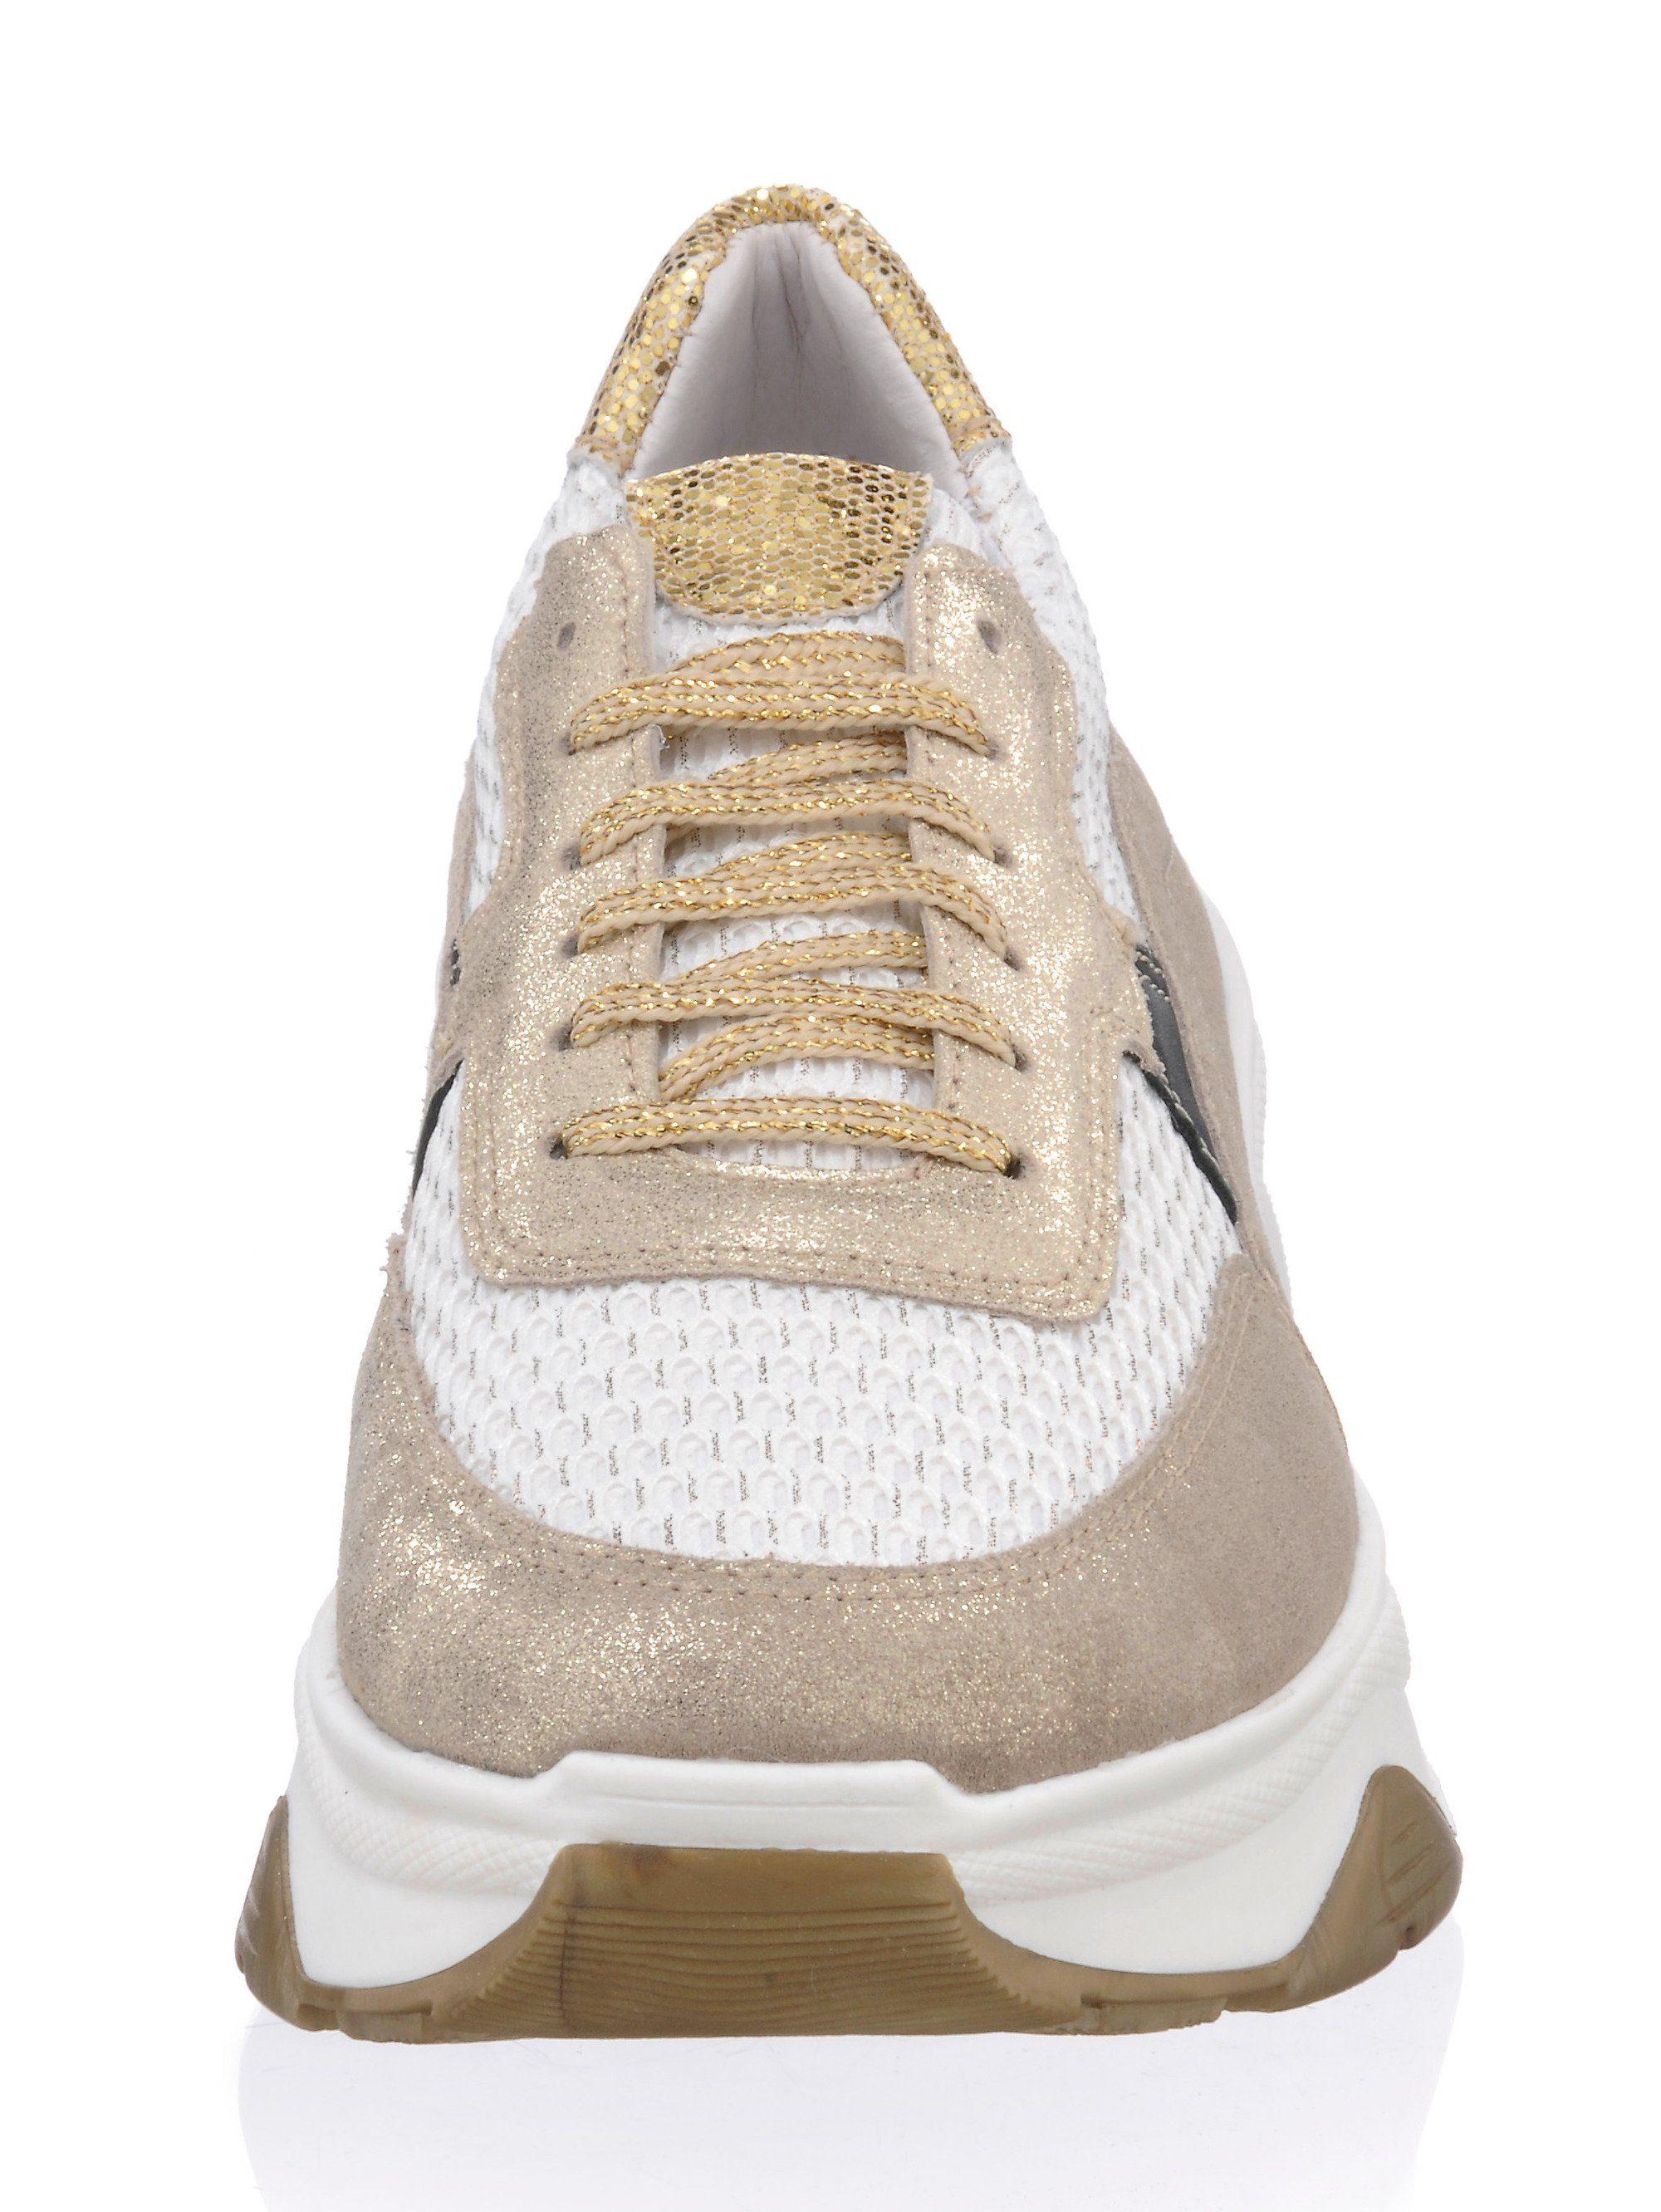 Alba Moda Sneaker in Chunky Form, Trendhighlight online kaufen   OTTO